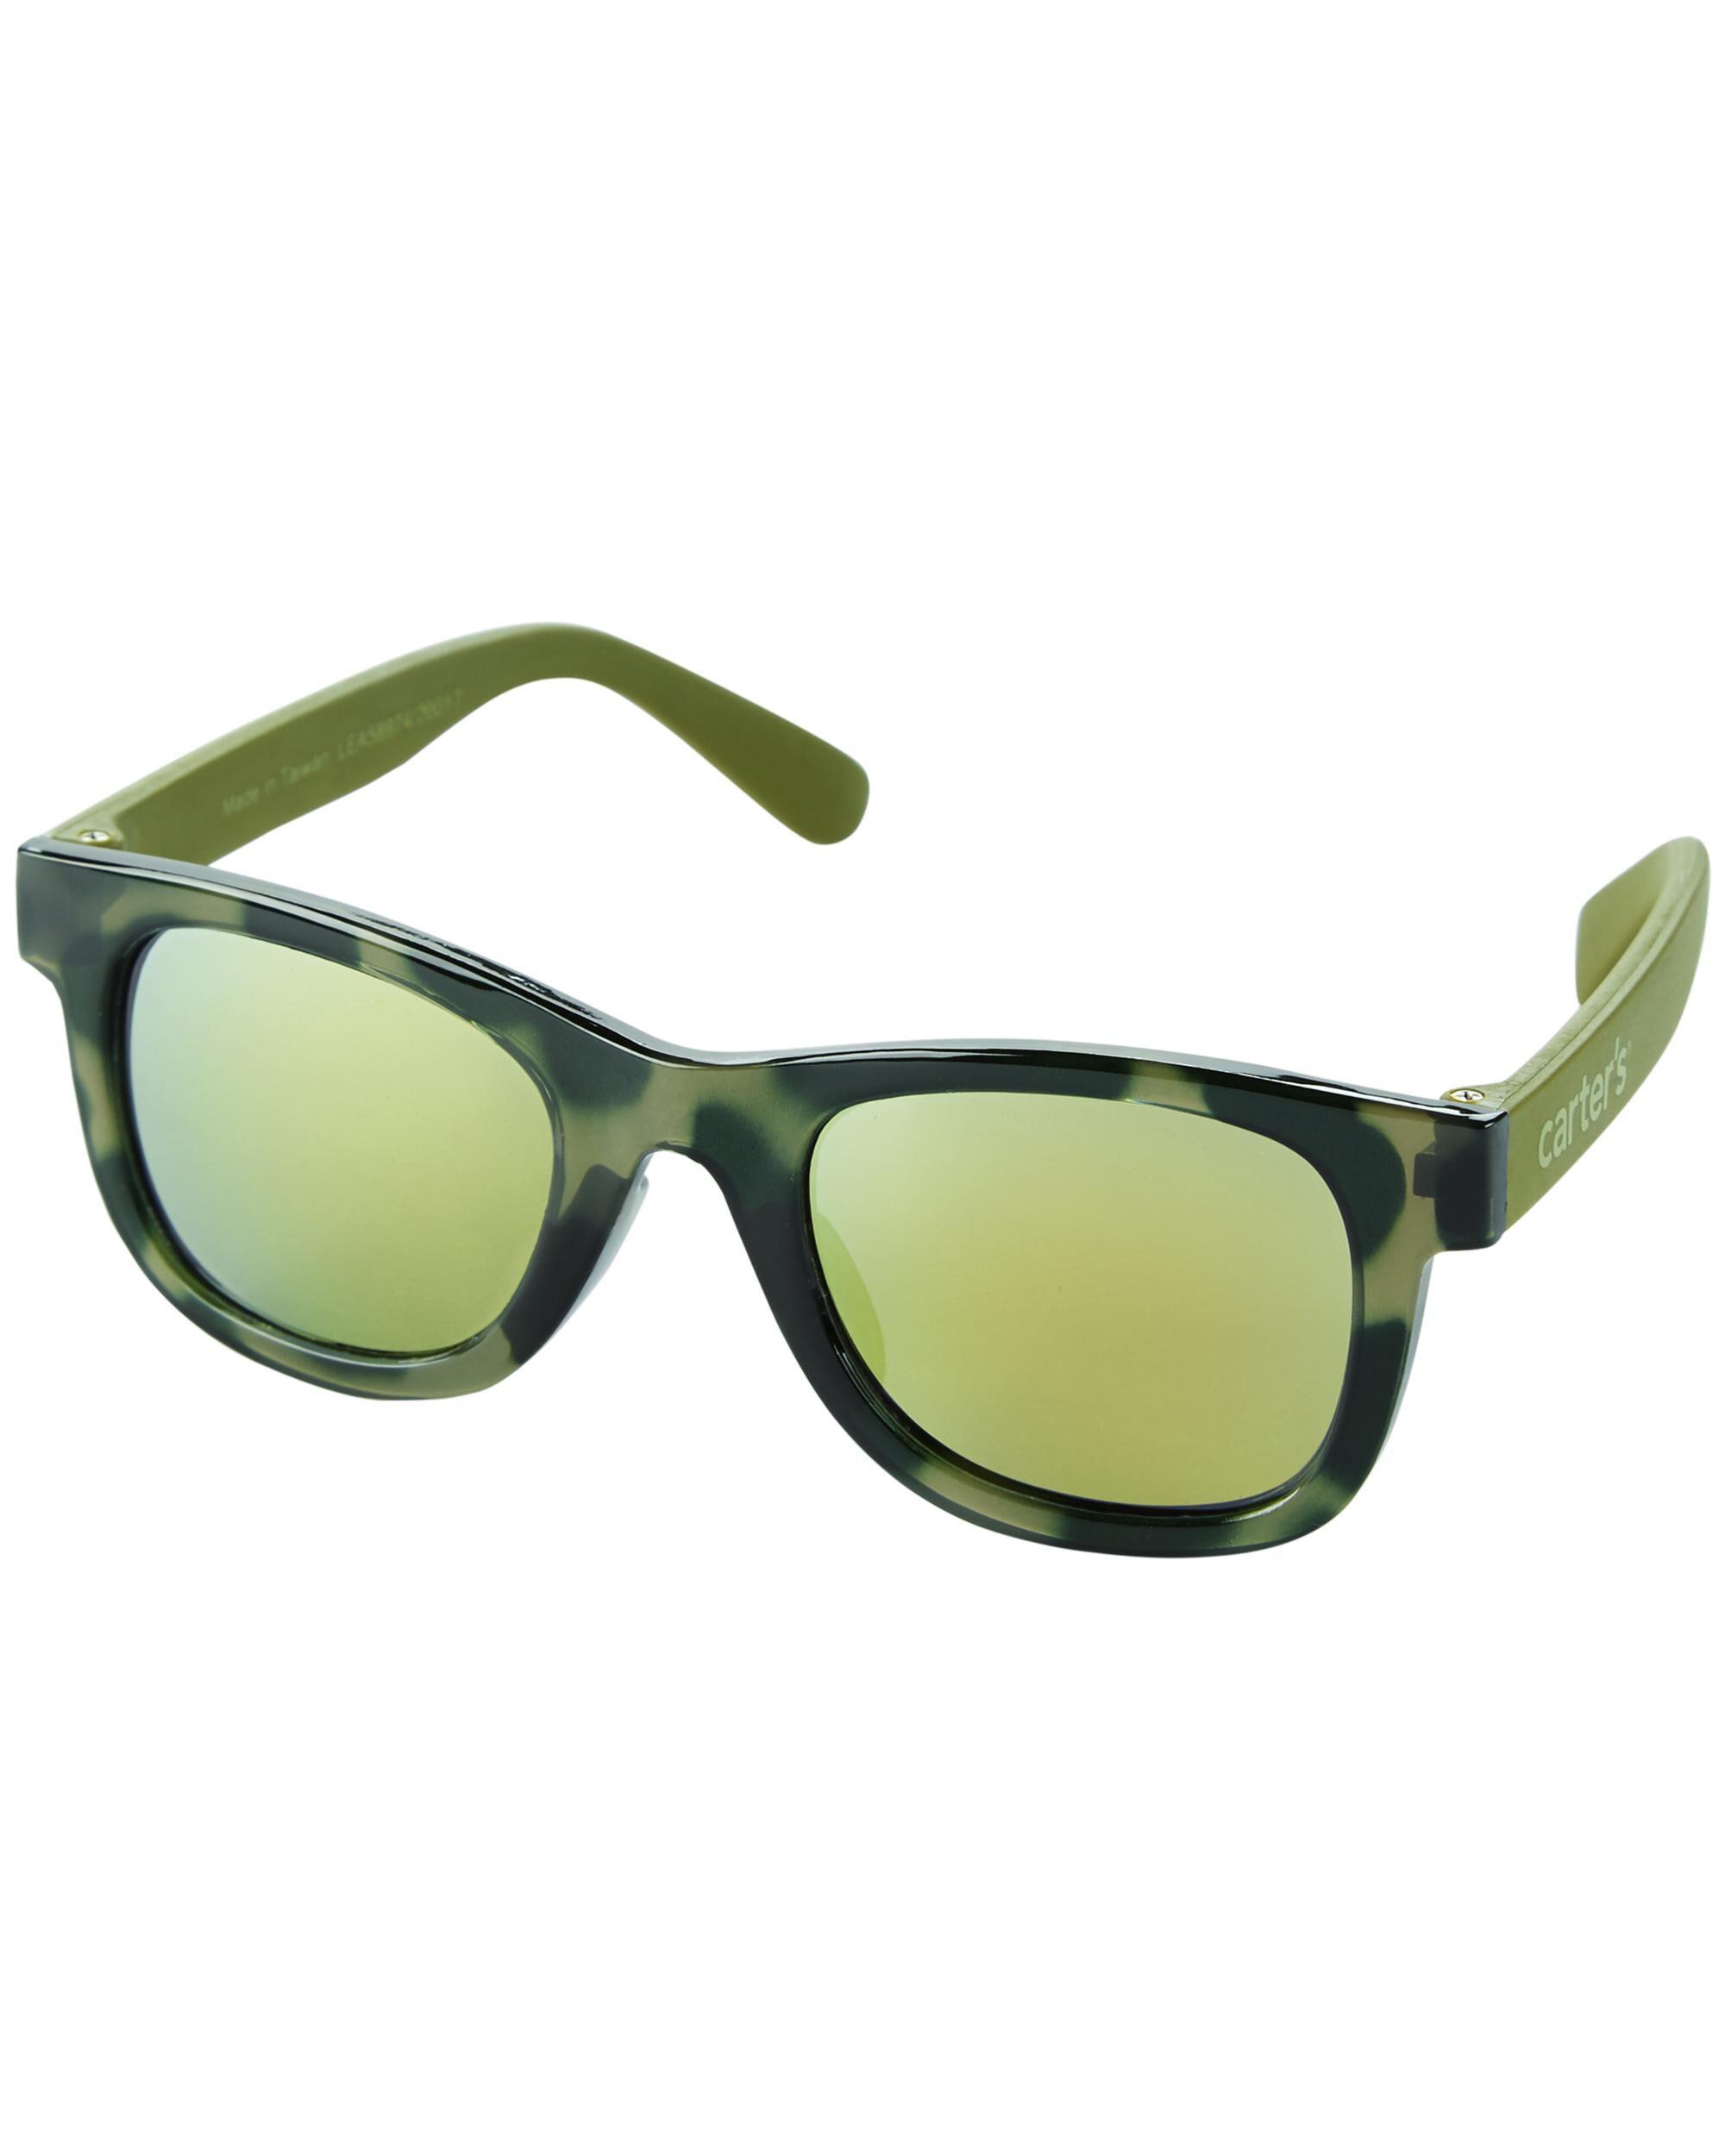 315e47bba2 Camo sunglasses loading zoom jpg 2000x2500 Camo sunglasses